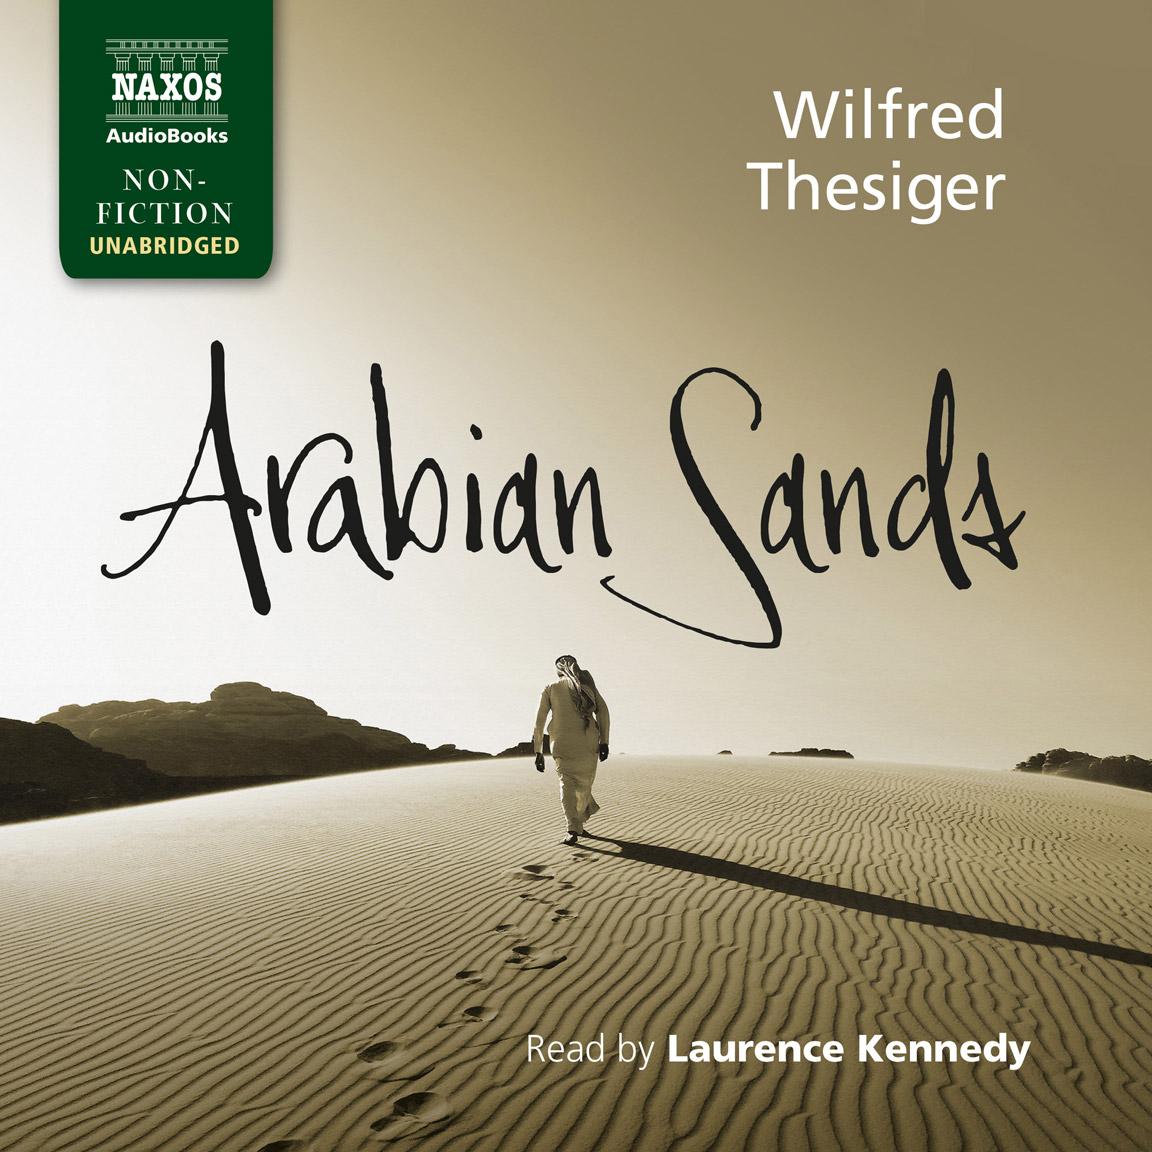 Arabian Sands (unabridged)